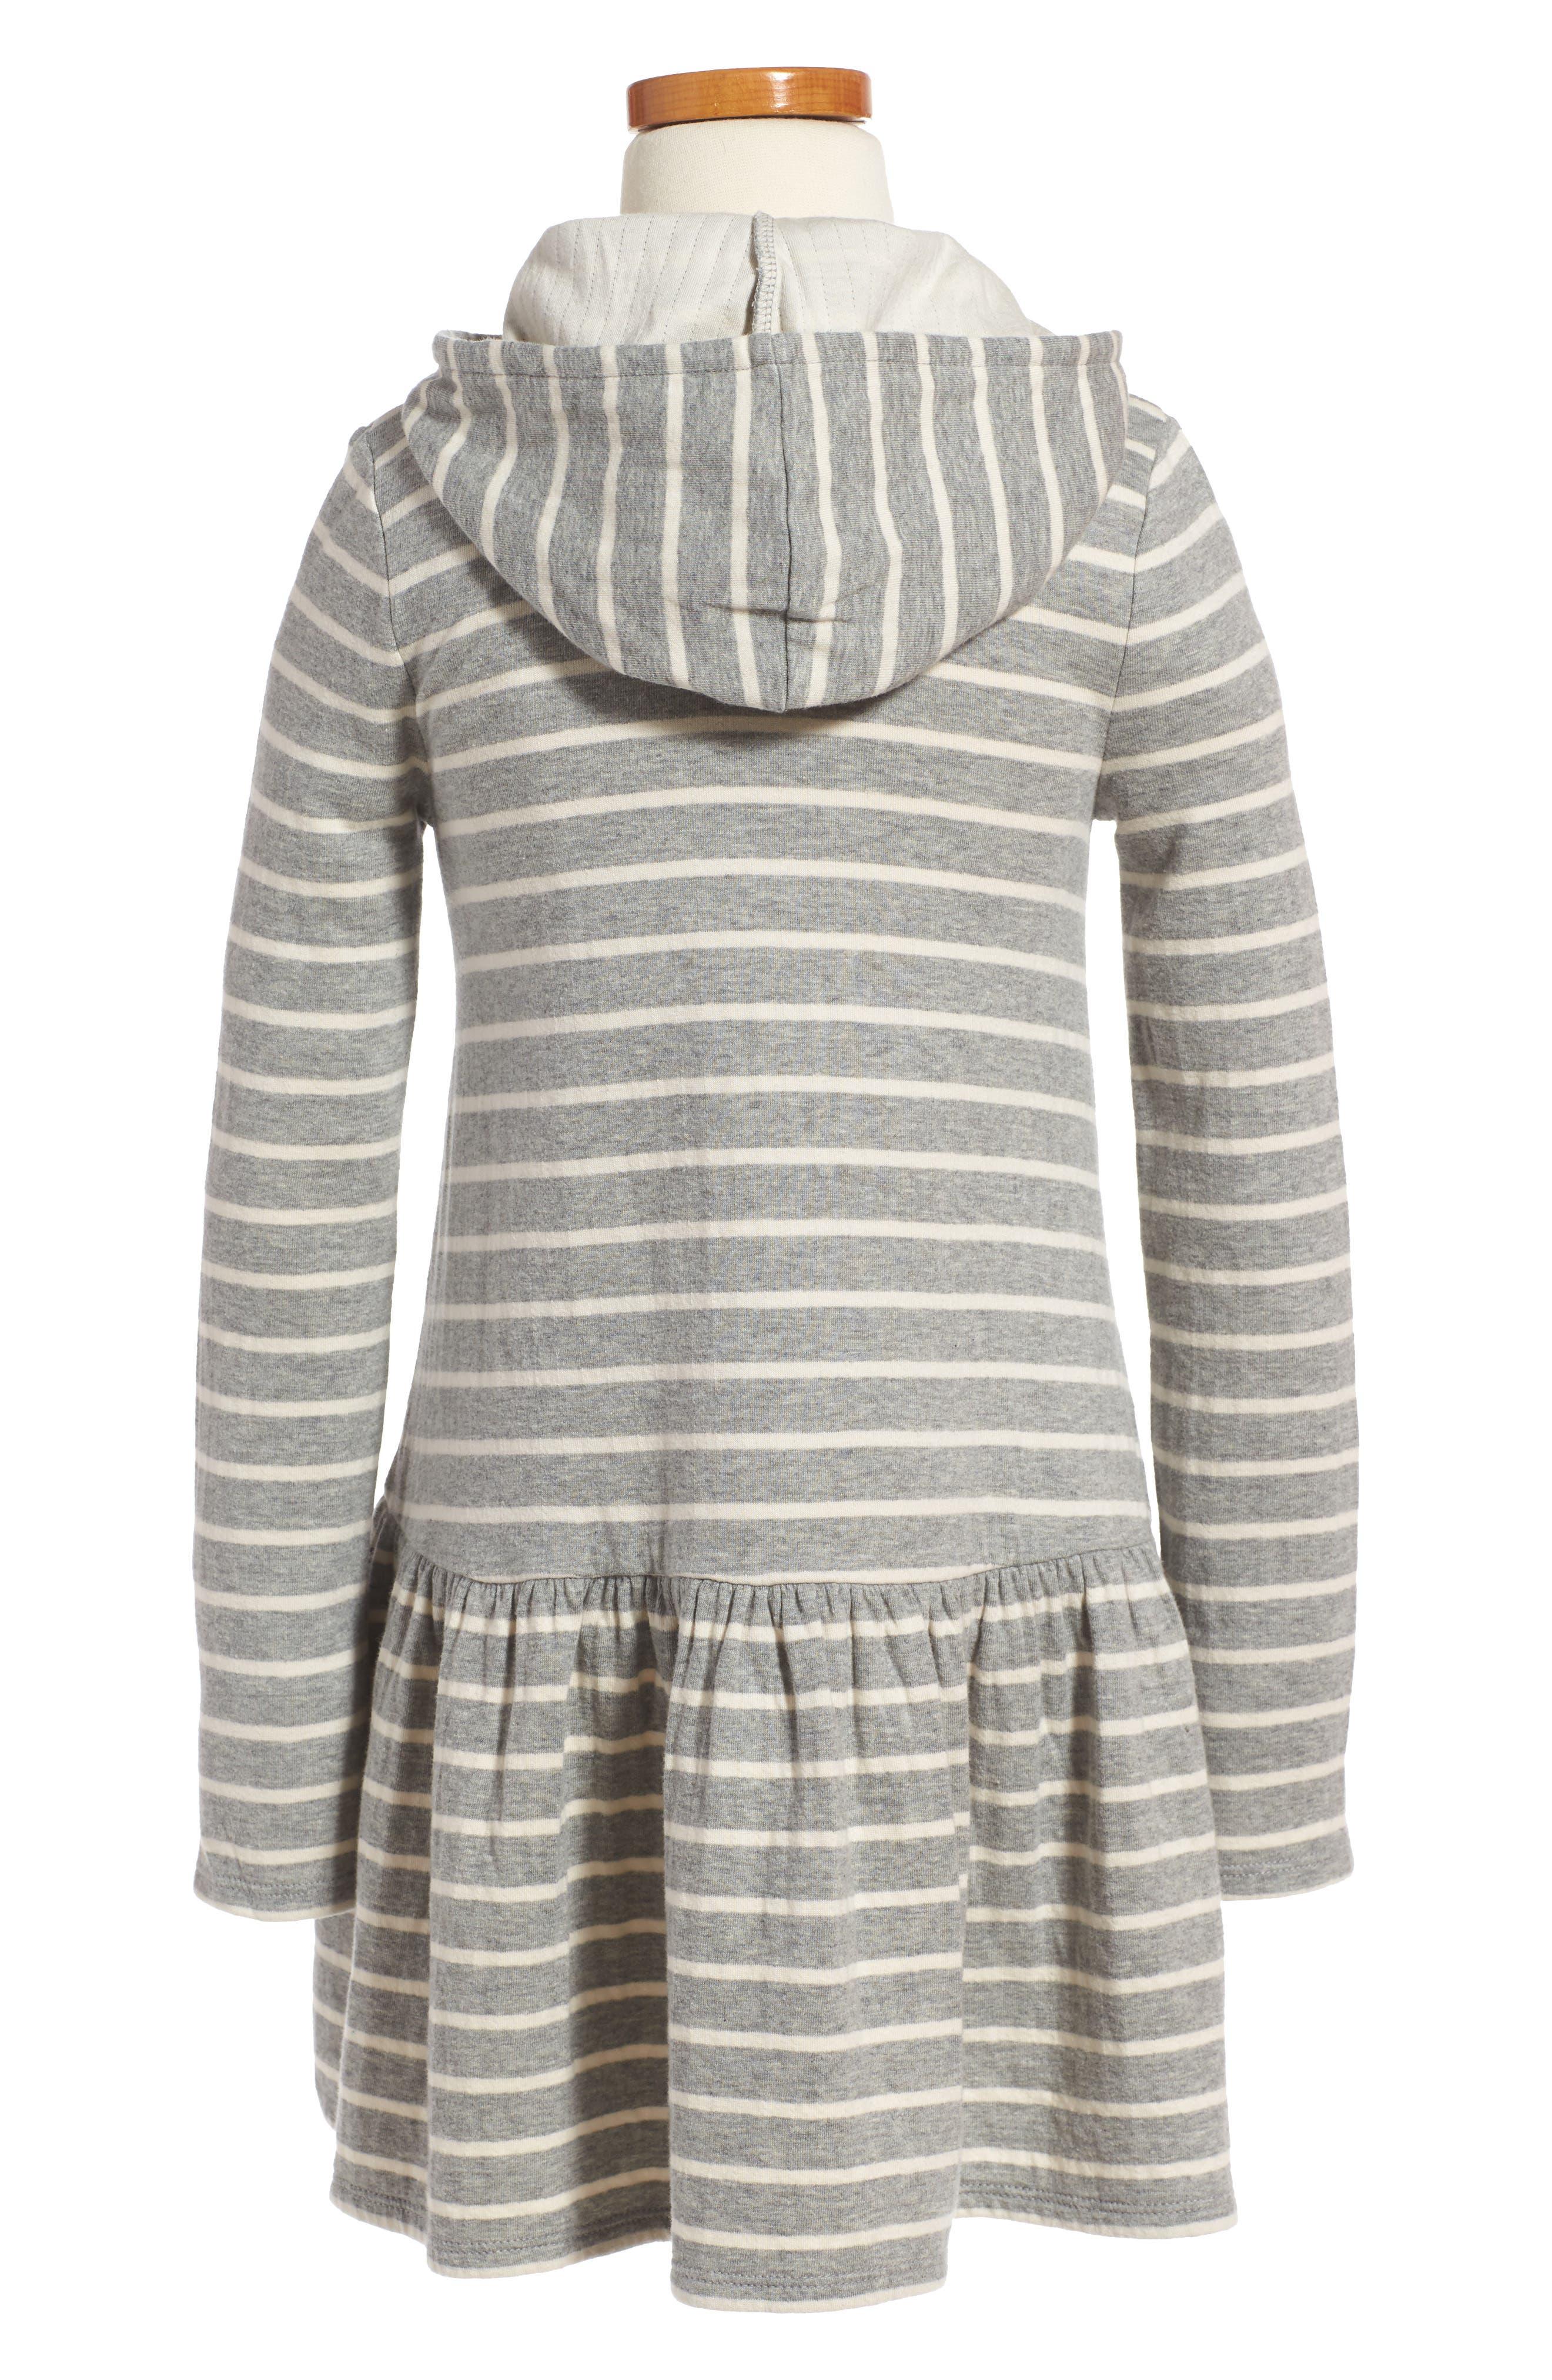 Alternate Image 2  - Tucker + Tate Stripe Hoodie Knit Dress (Toddler Girls, Little Girls & Big Girls)